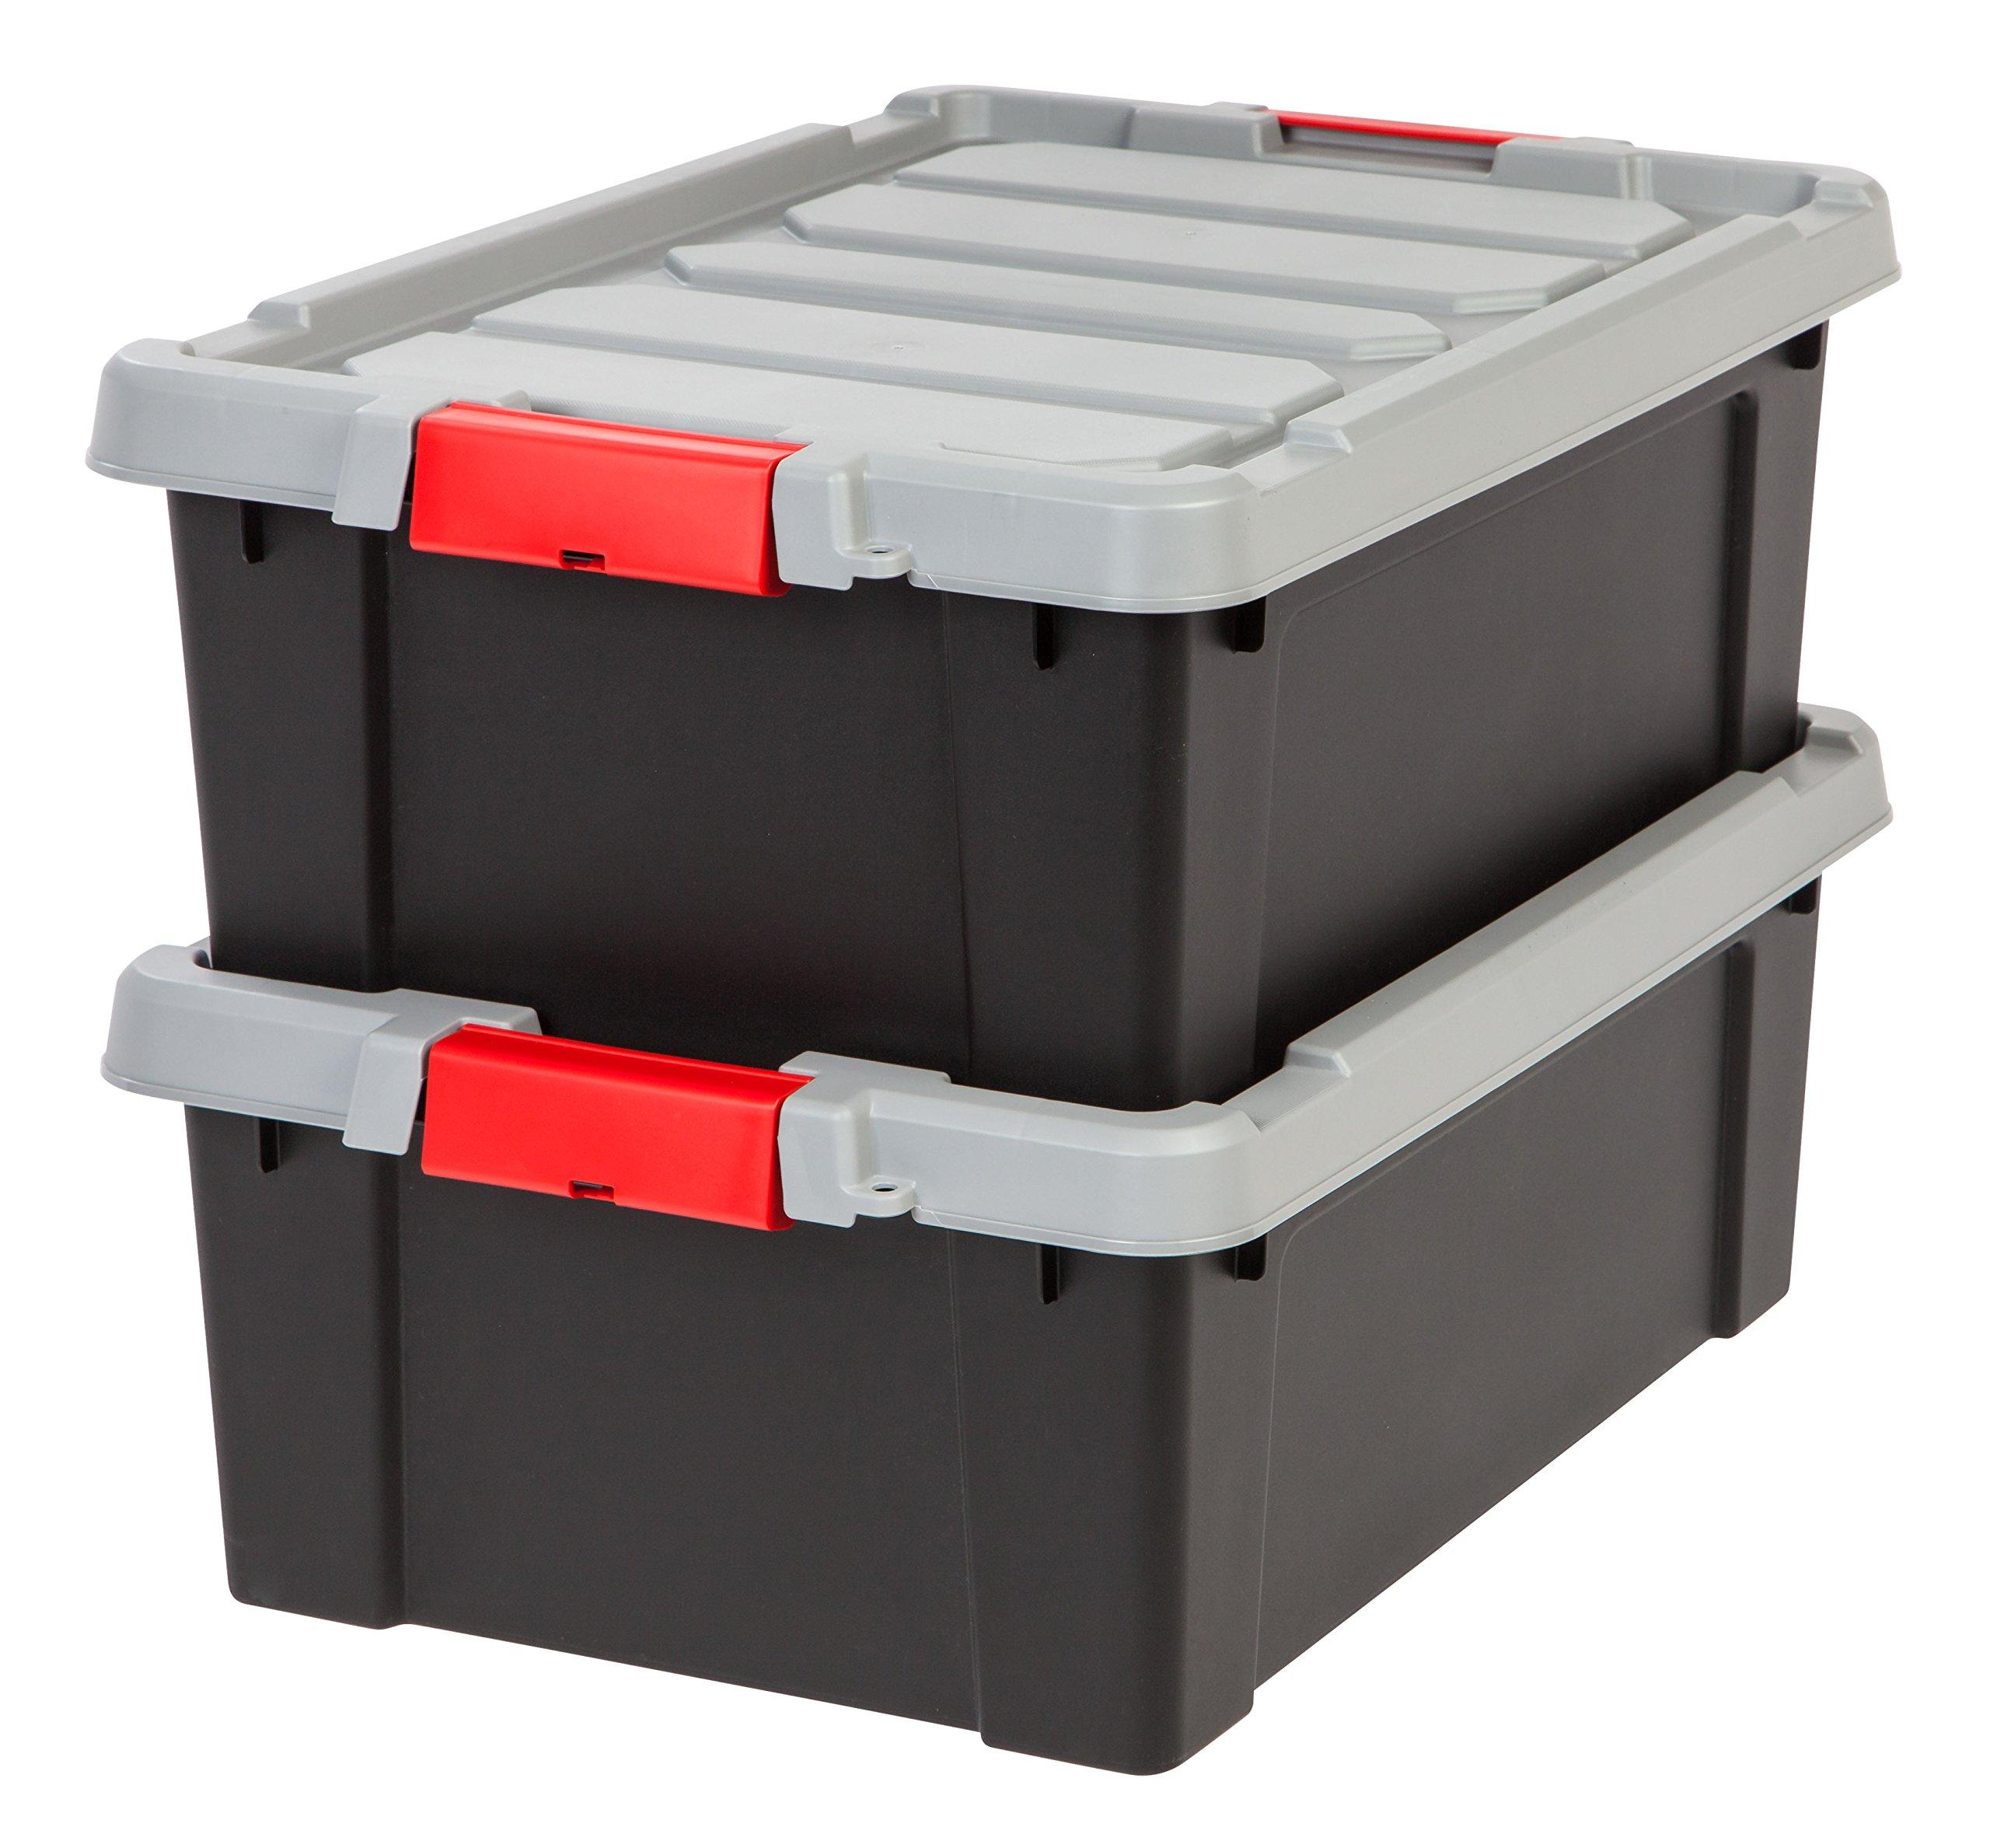 IRIS USA, Inc. 586520 IRIS Store-It-All Tote 10 Gallon, 2 Pack, Black, 11.75, Red Buckle by IRIS USA, Inc.